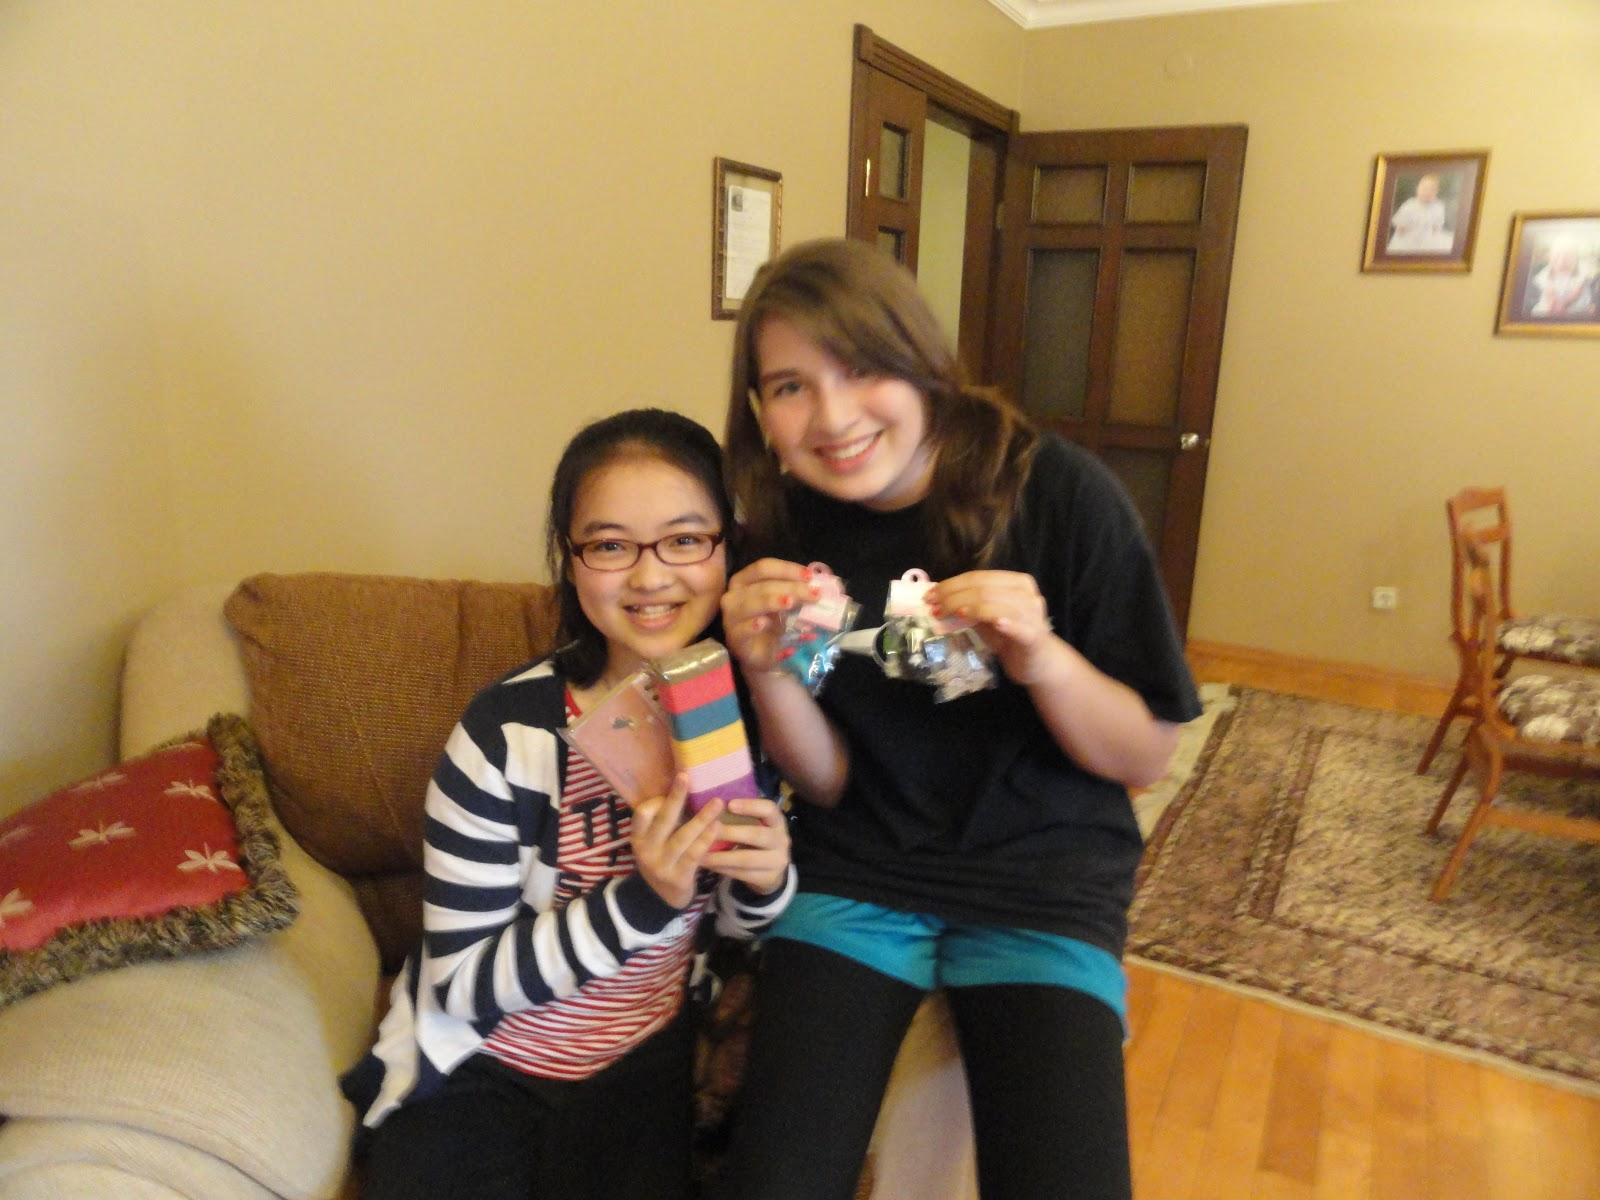 The Herndon Herald: 7th grade girls sleepover